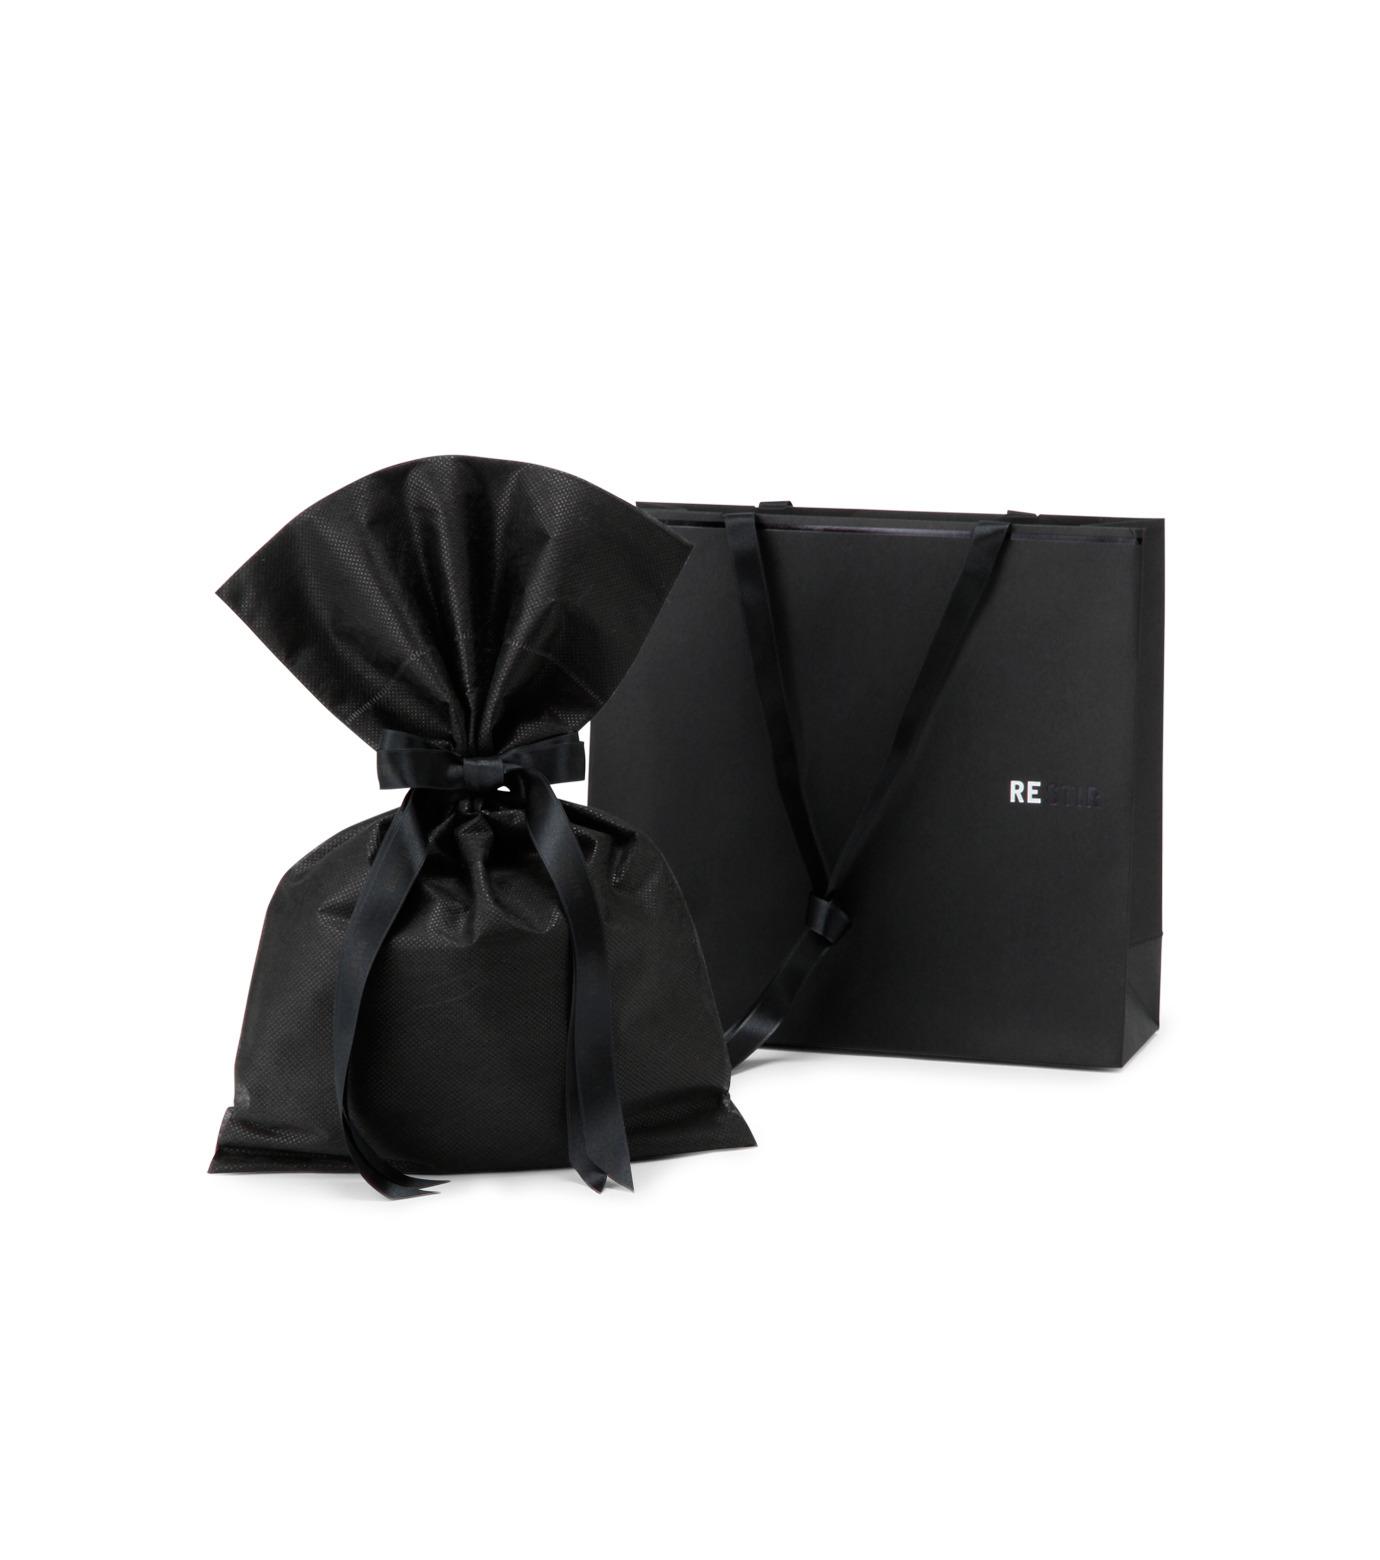 Gift wrapping gift box set black restir gift wrappinggift box set black gift box set negle Choice Image